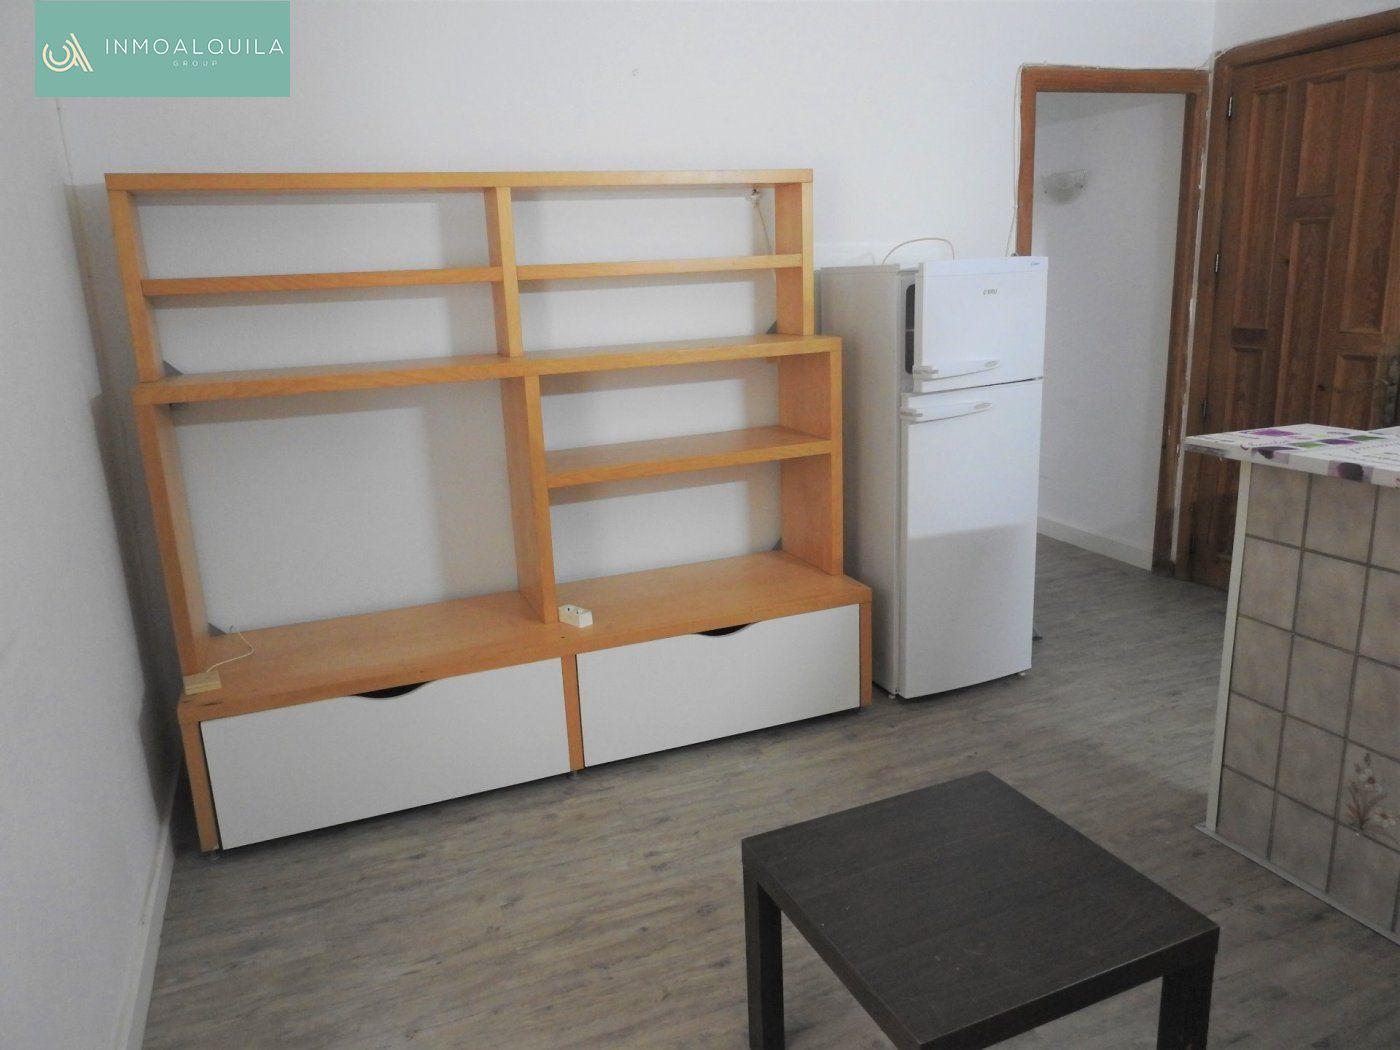 Alquiler Piso  Can picafort ,can picafort. Bonito apartamento en can picafort. 50m2. 1hab. 1baño,  primera